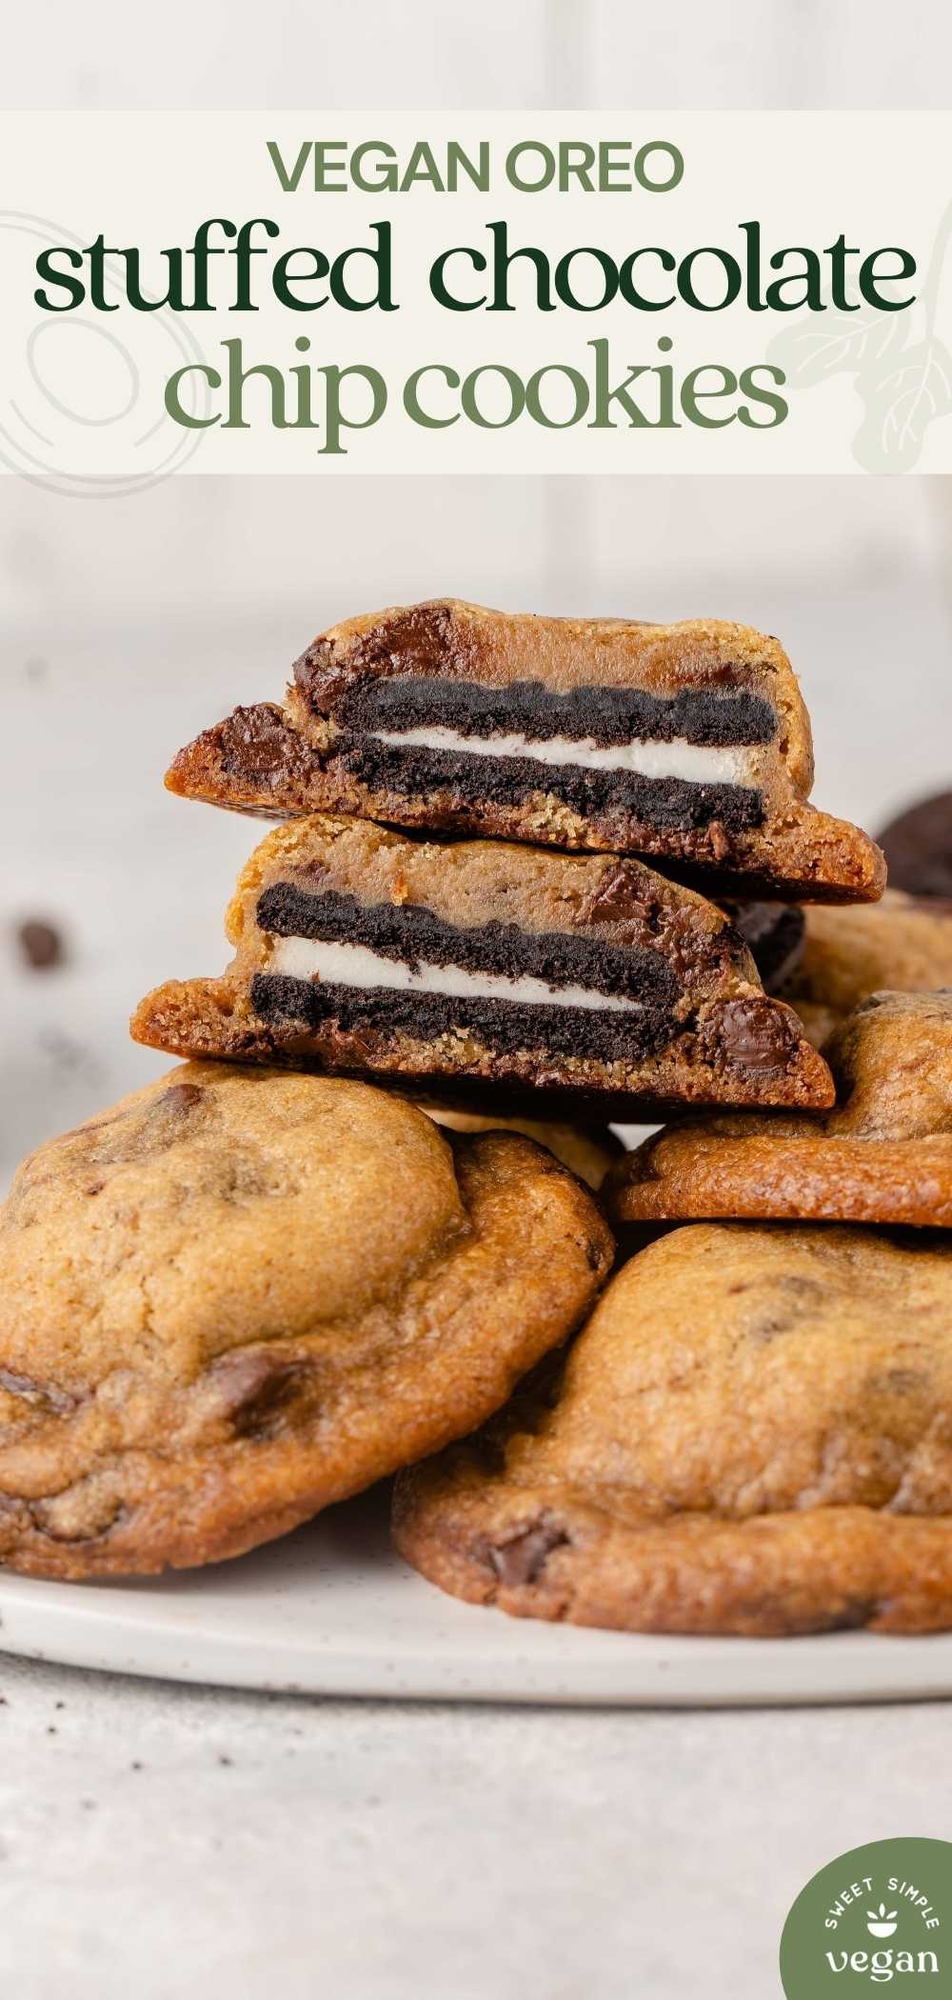 pinterest image of oreo stuffed chocolate chip cookies on plate